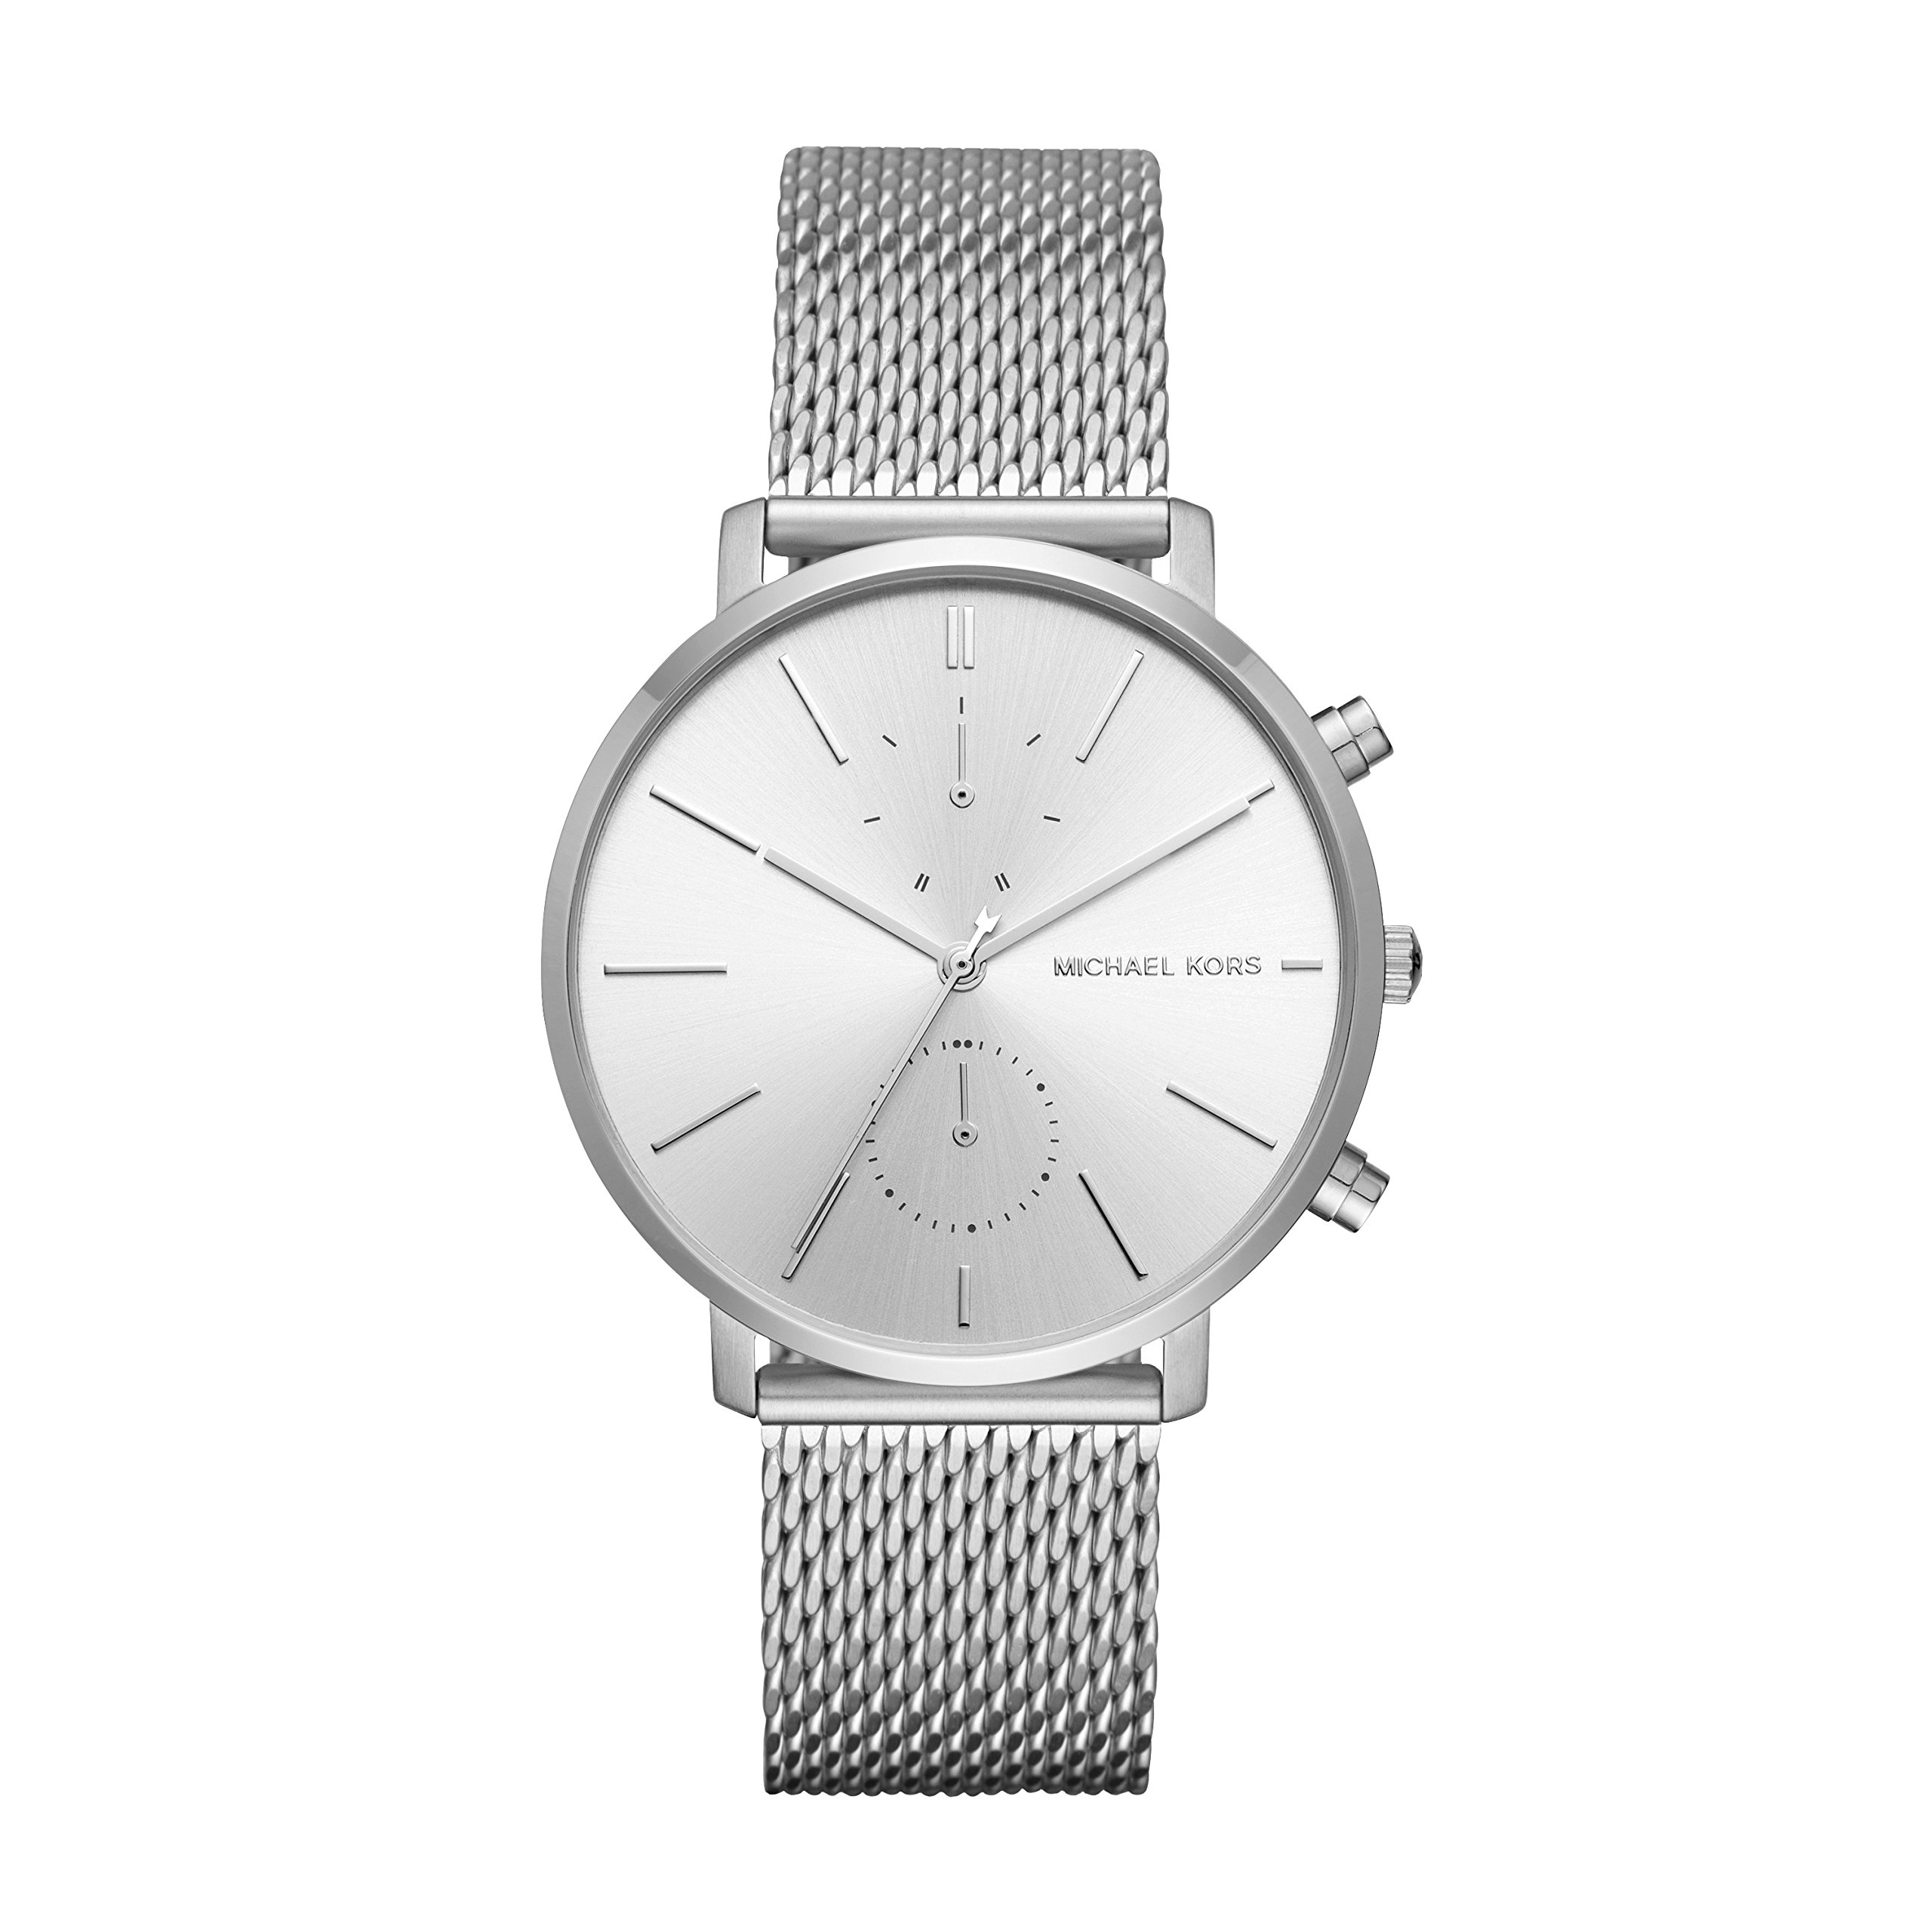 Michael Kors MK8541 Jaryn Silver Stainless Steel Mesh Strap Chronograph Men's Watch